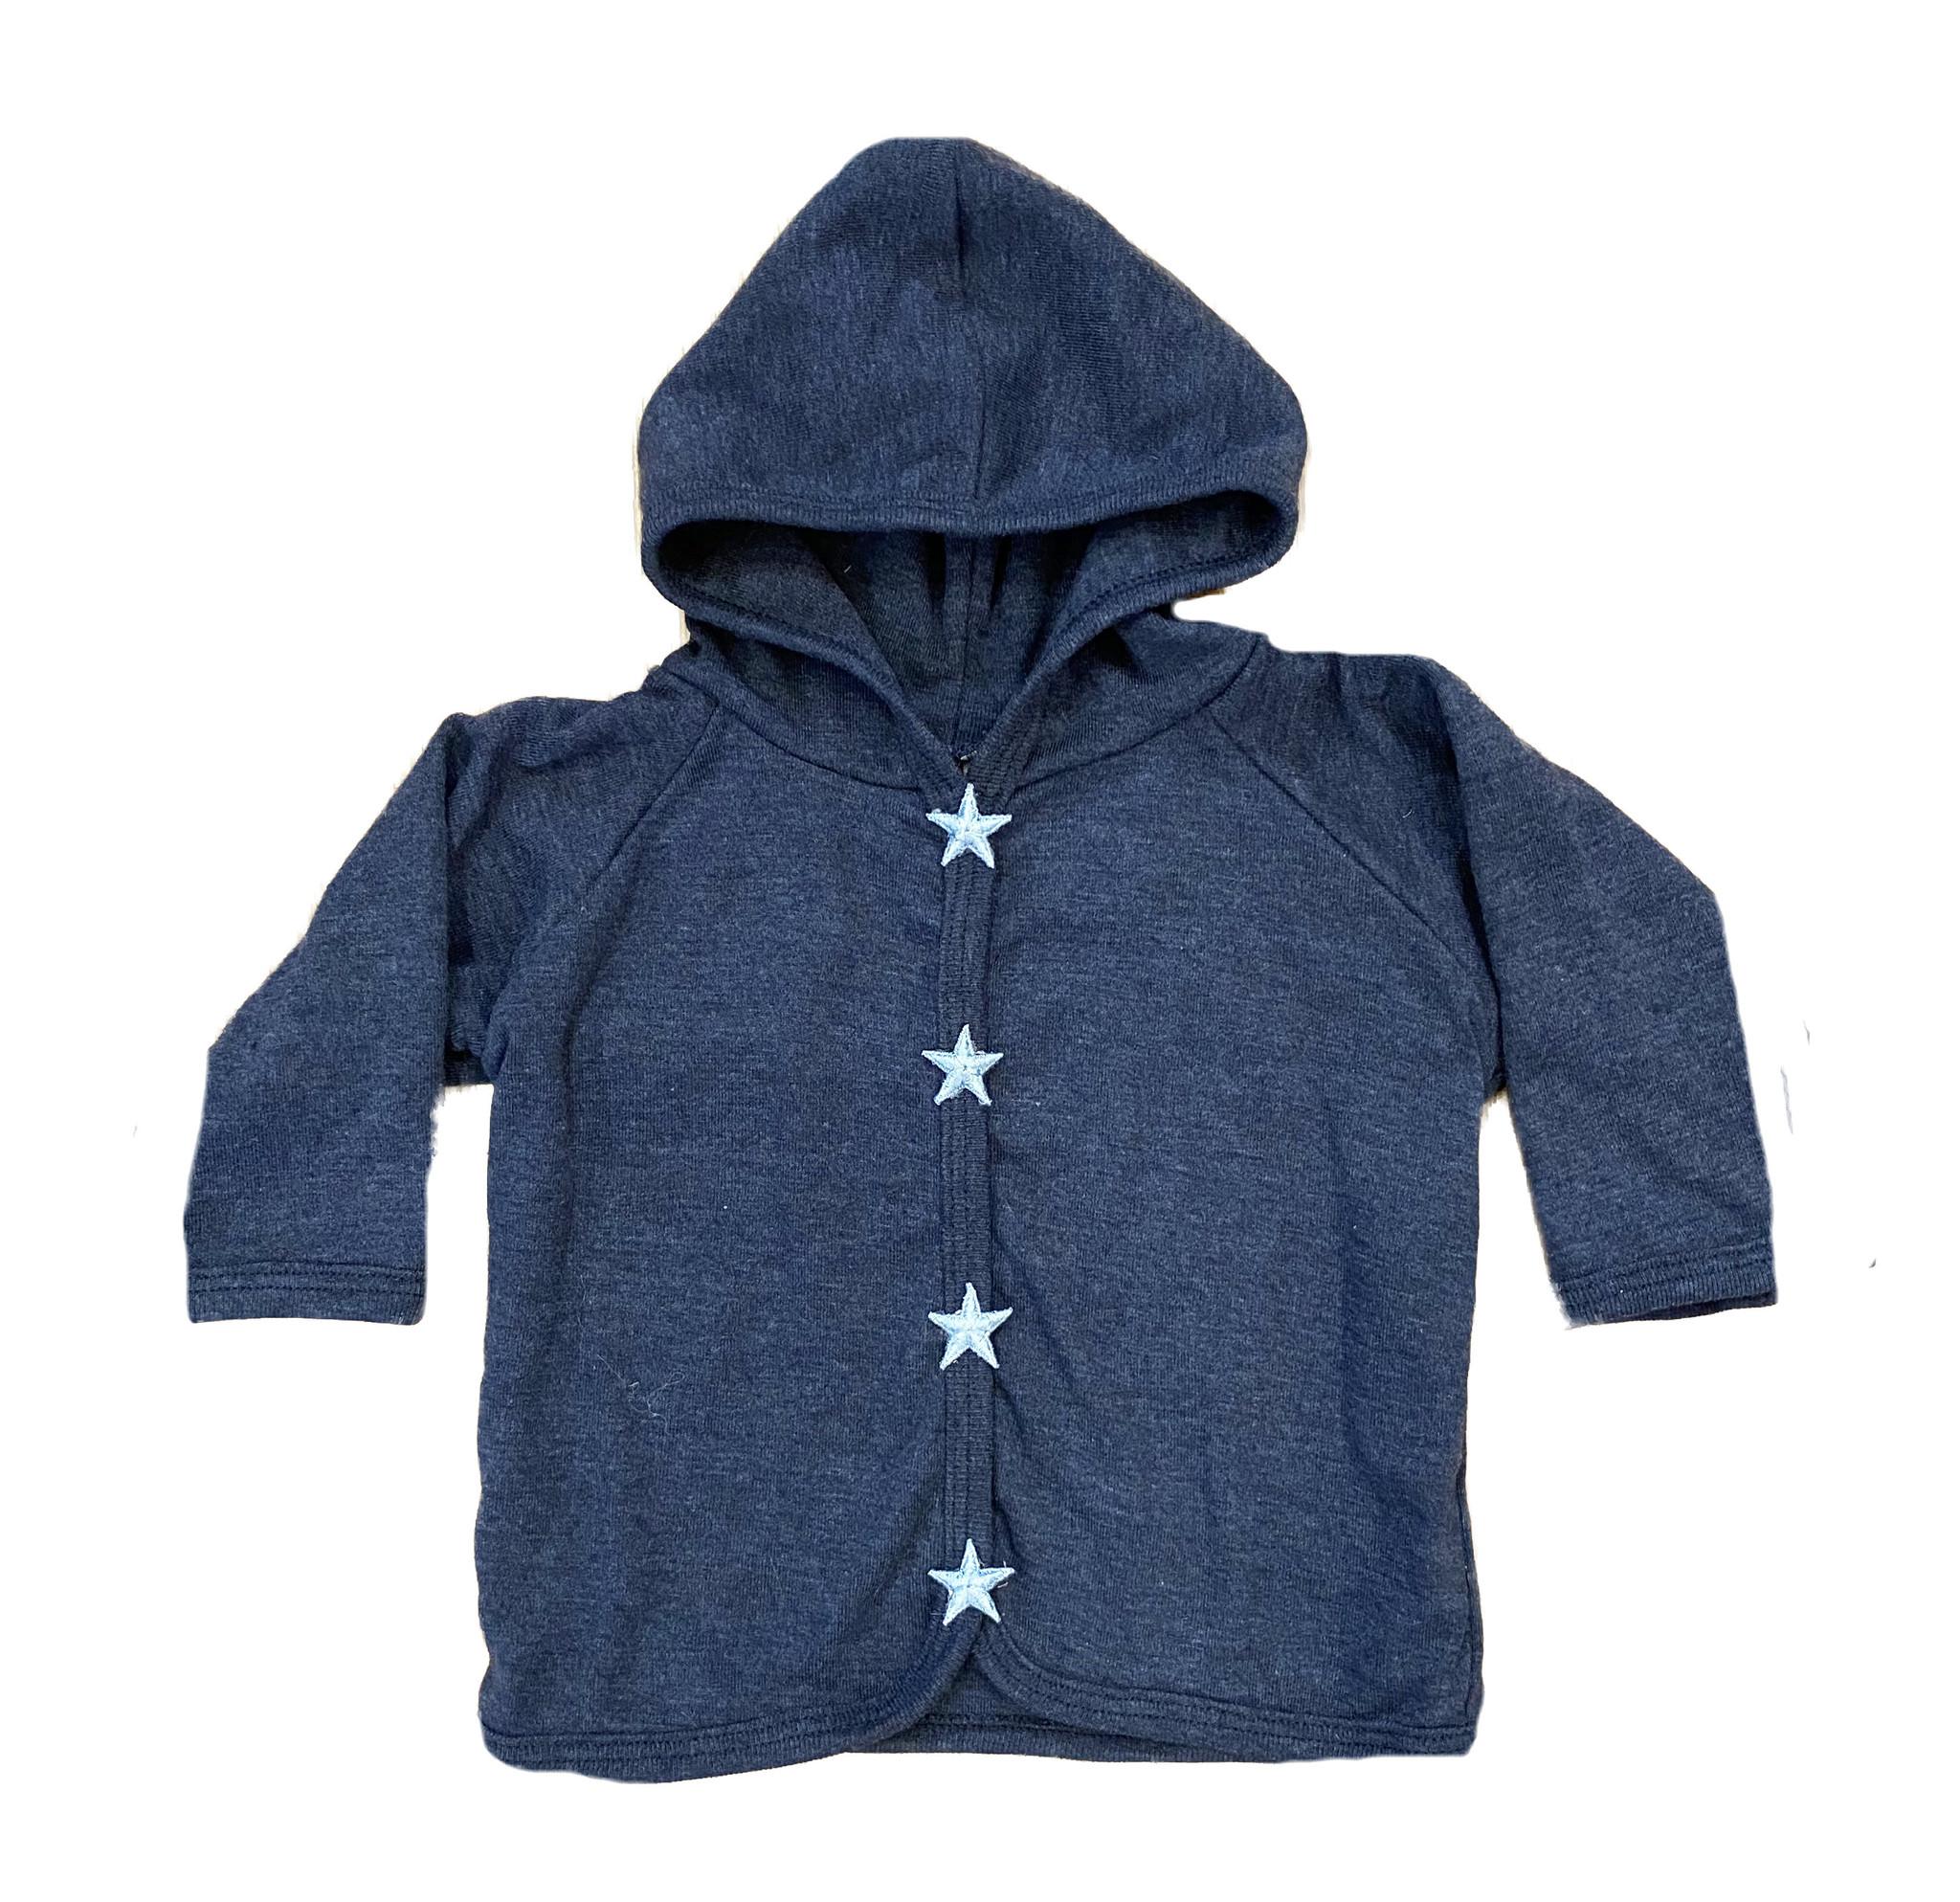 Too Sweet Denim with Lt Blue Stars Hooded Jacket